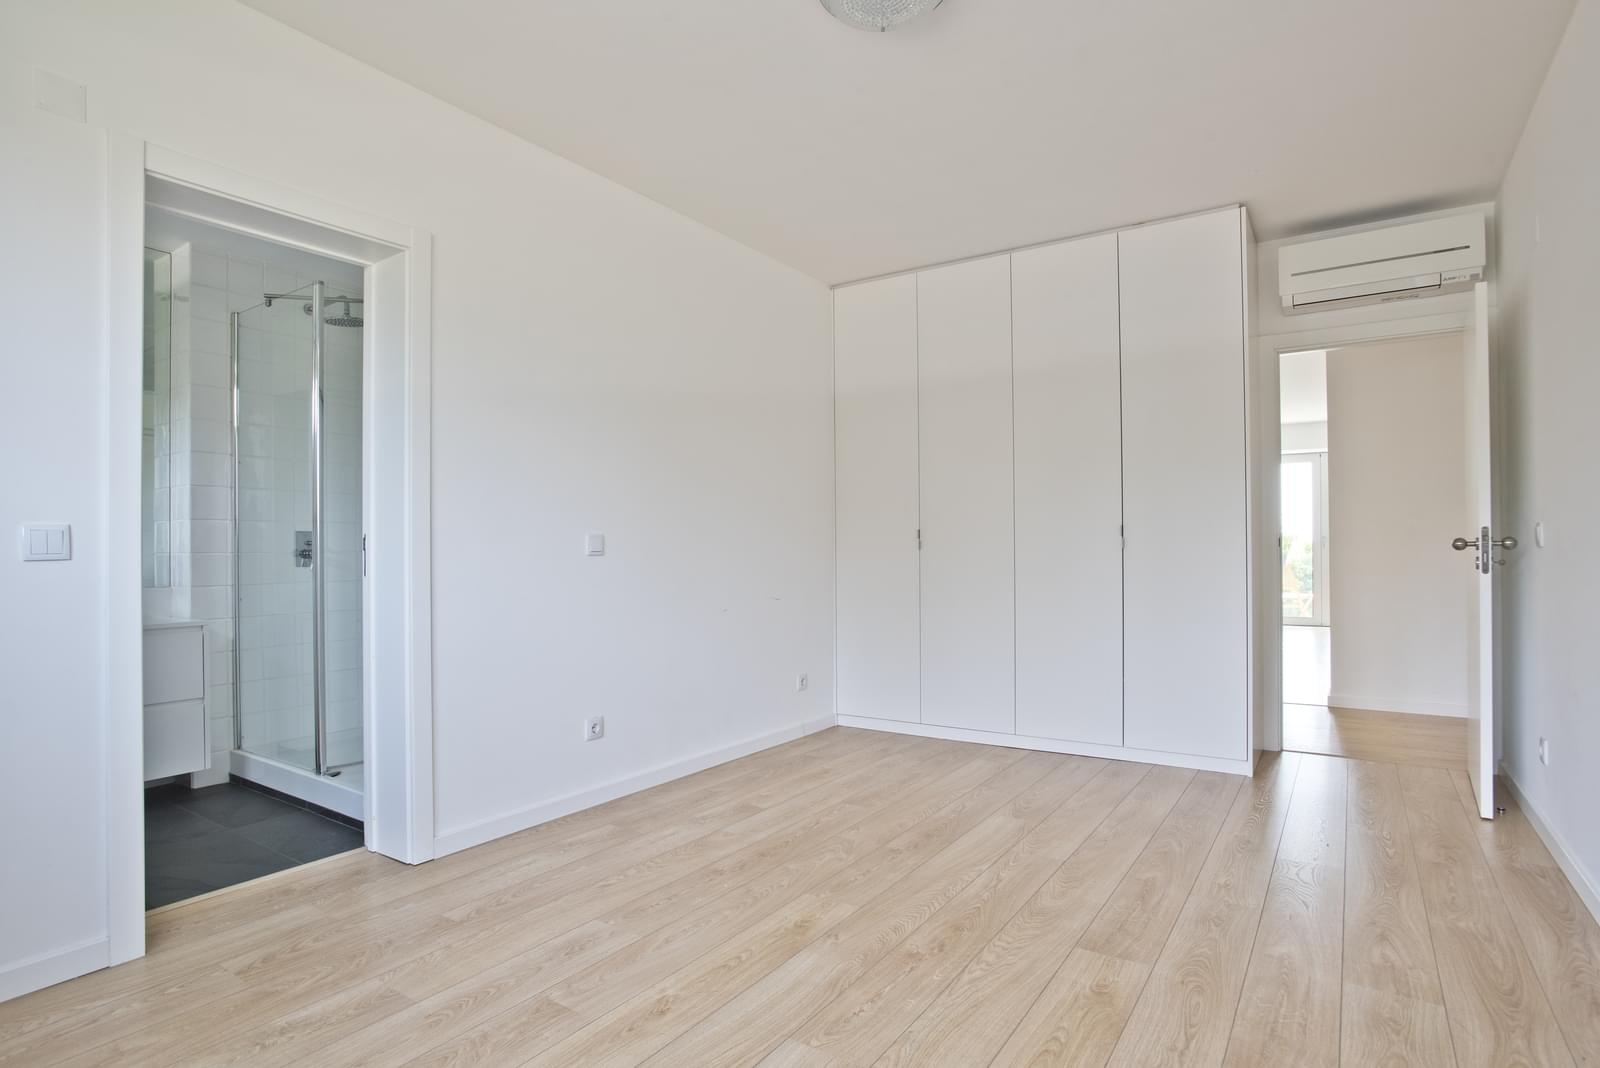 pf13975-apartamento-t4-oeiras-476bda3d-3822-48a0-ac56-7216f39859c7